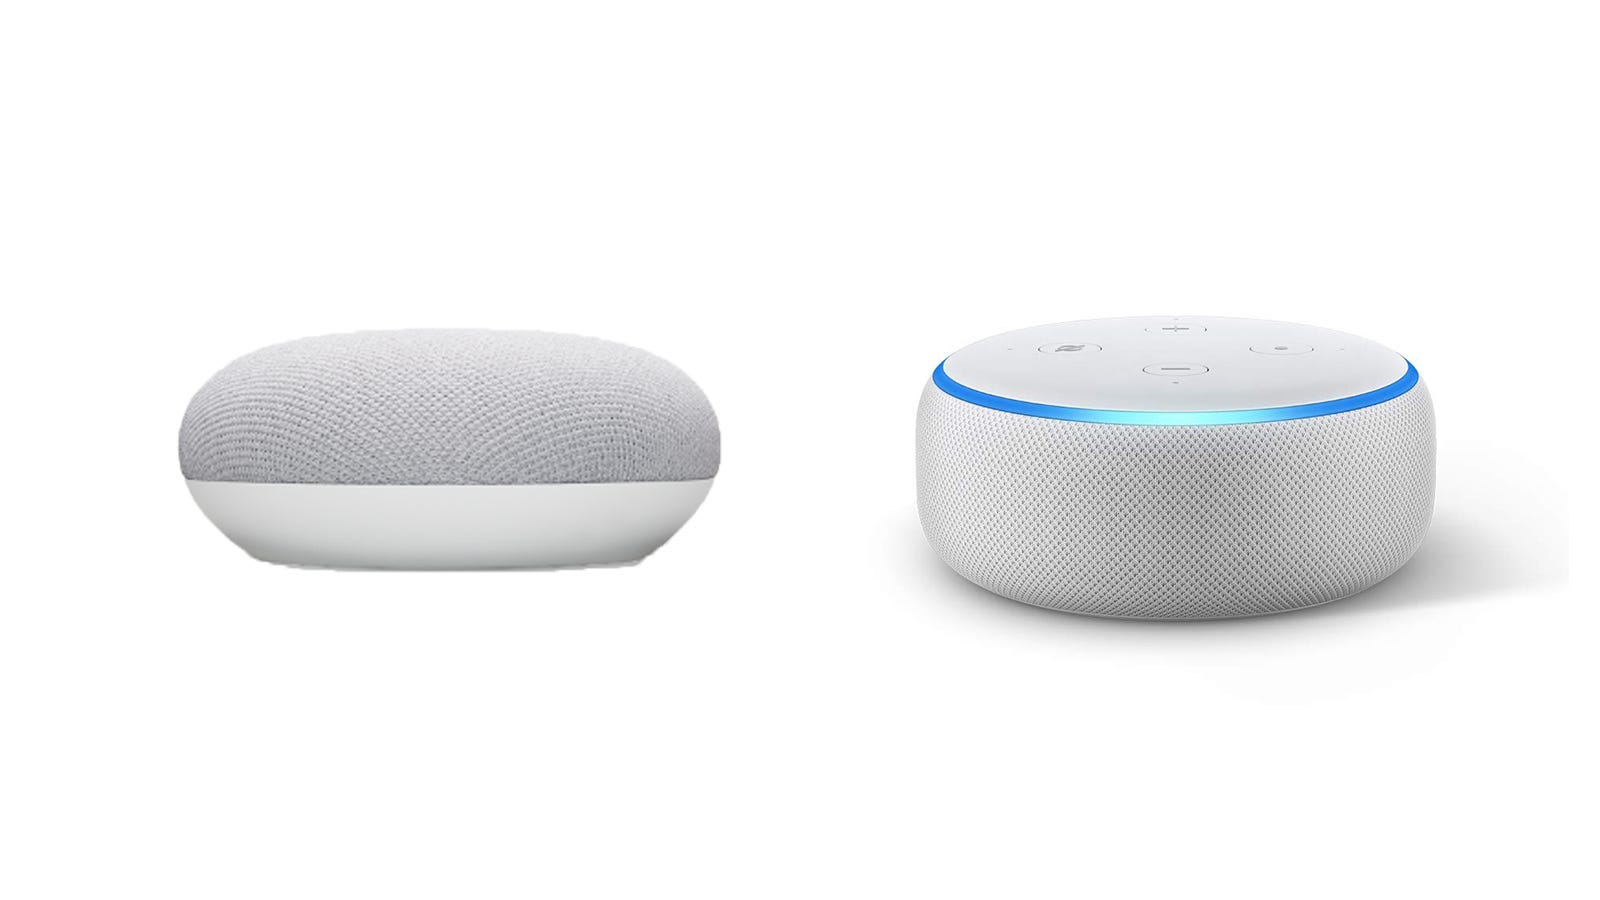 Nest Mini and Echo Dot